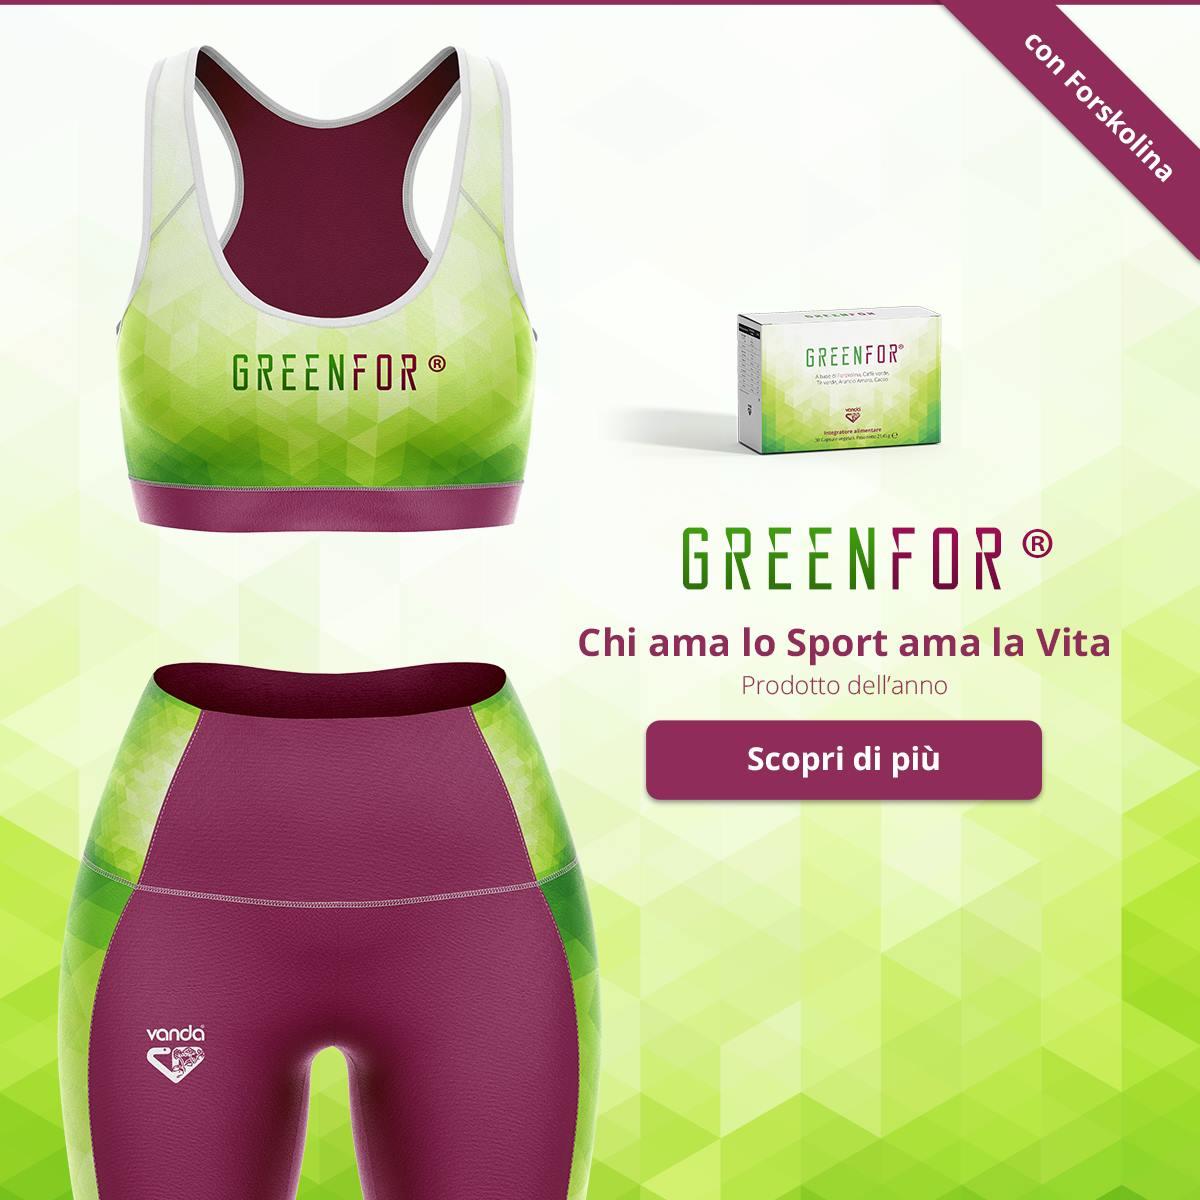 greenfor vanda termogenico naturale